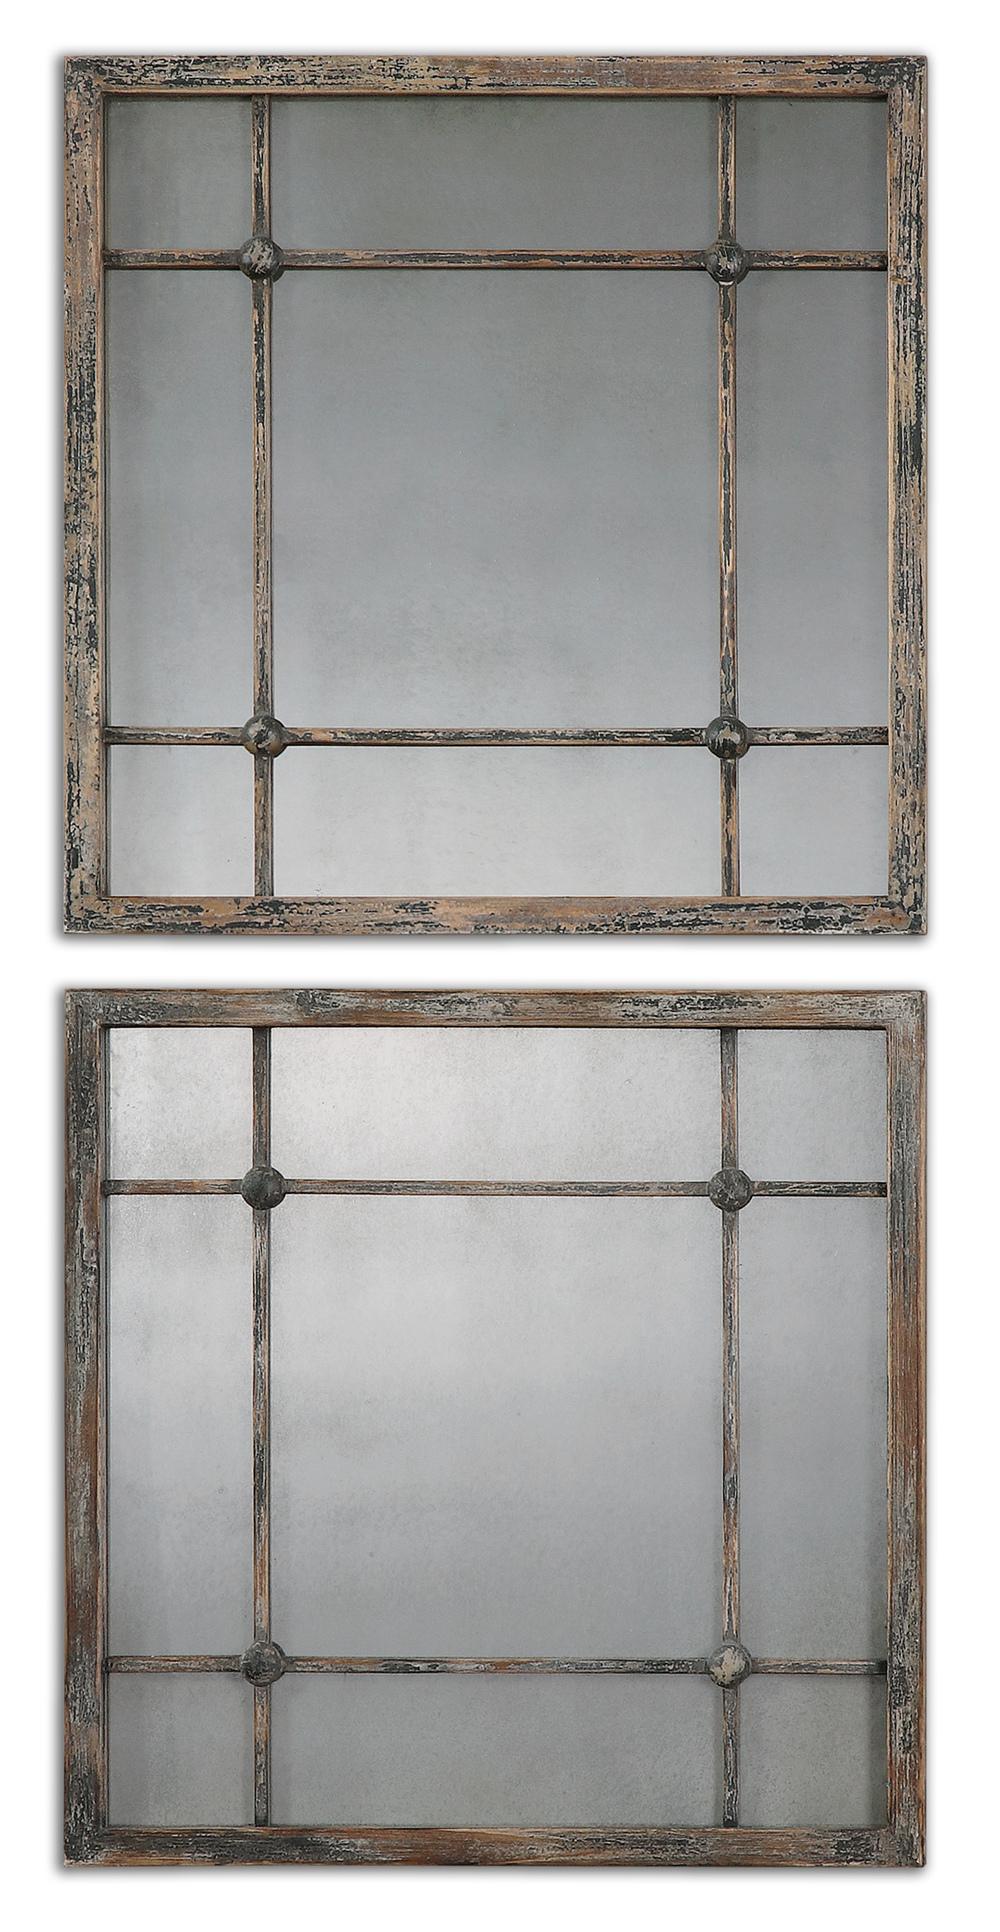 Uttermost Company - Saragano Square Mirrors, Set/2